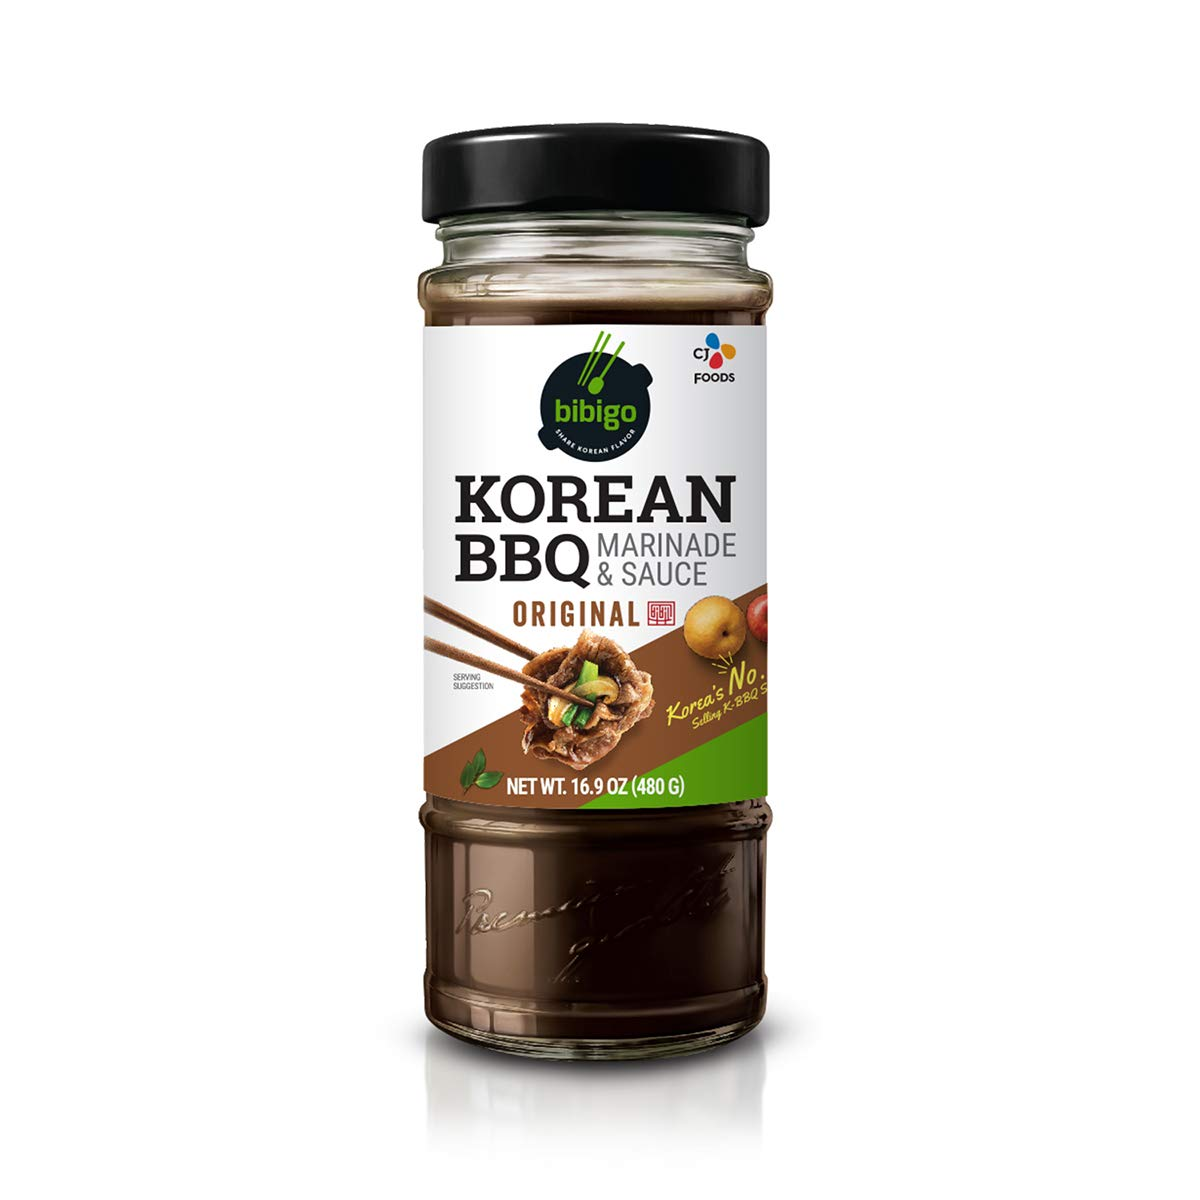 Bibigo 16.9oz 6-Pack Original Korean BBQ Sauce  $18.76 Coupon